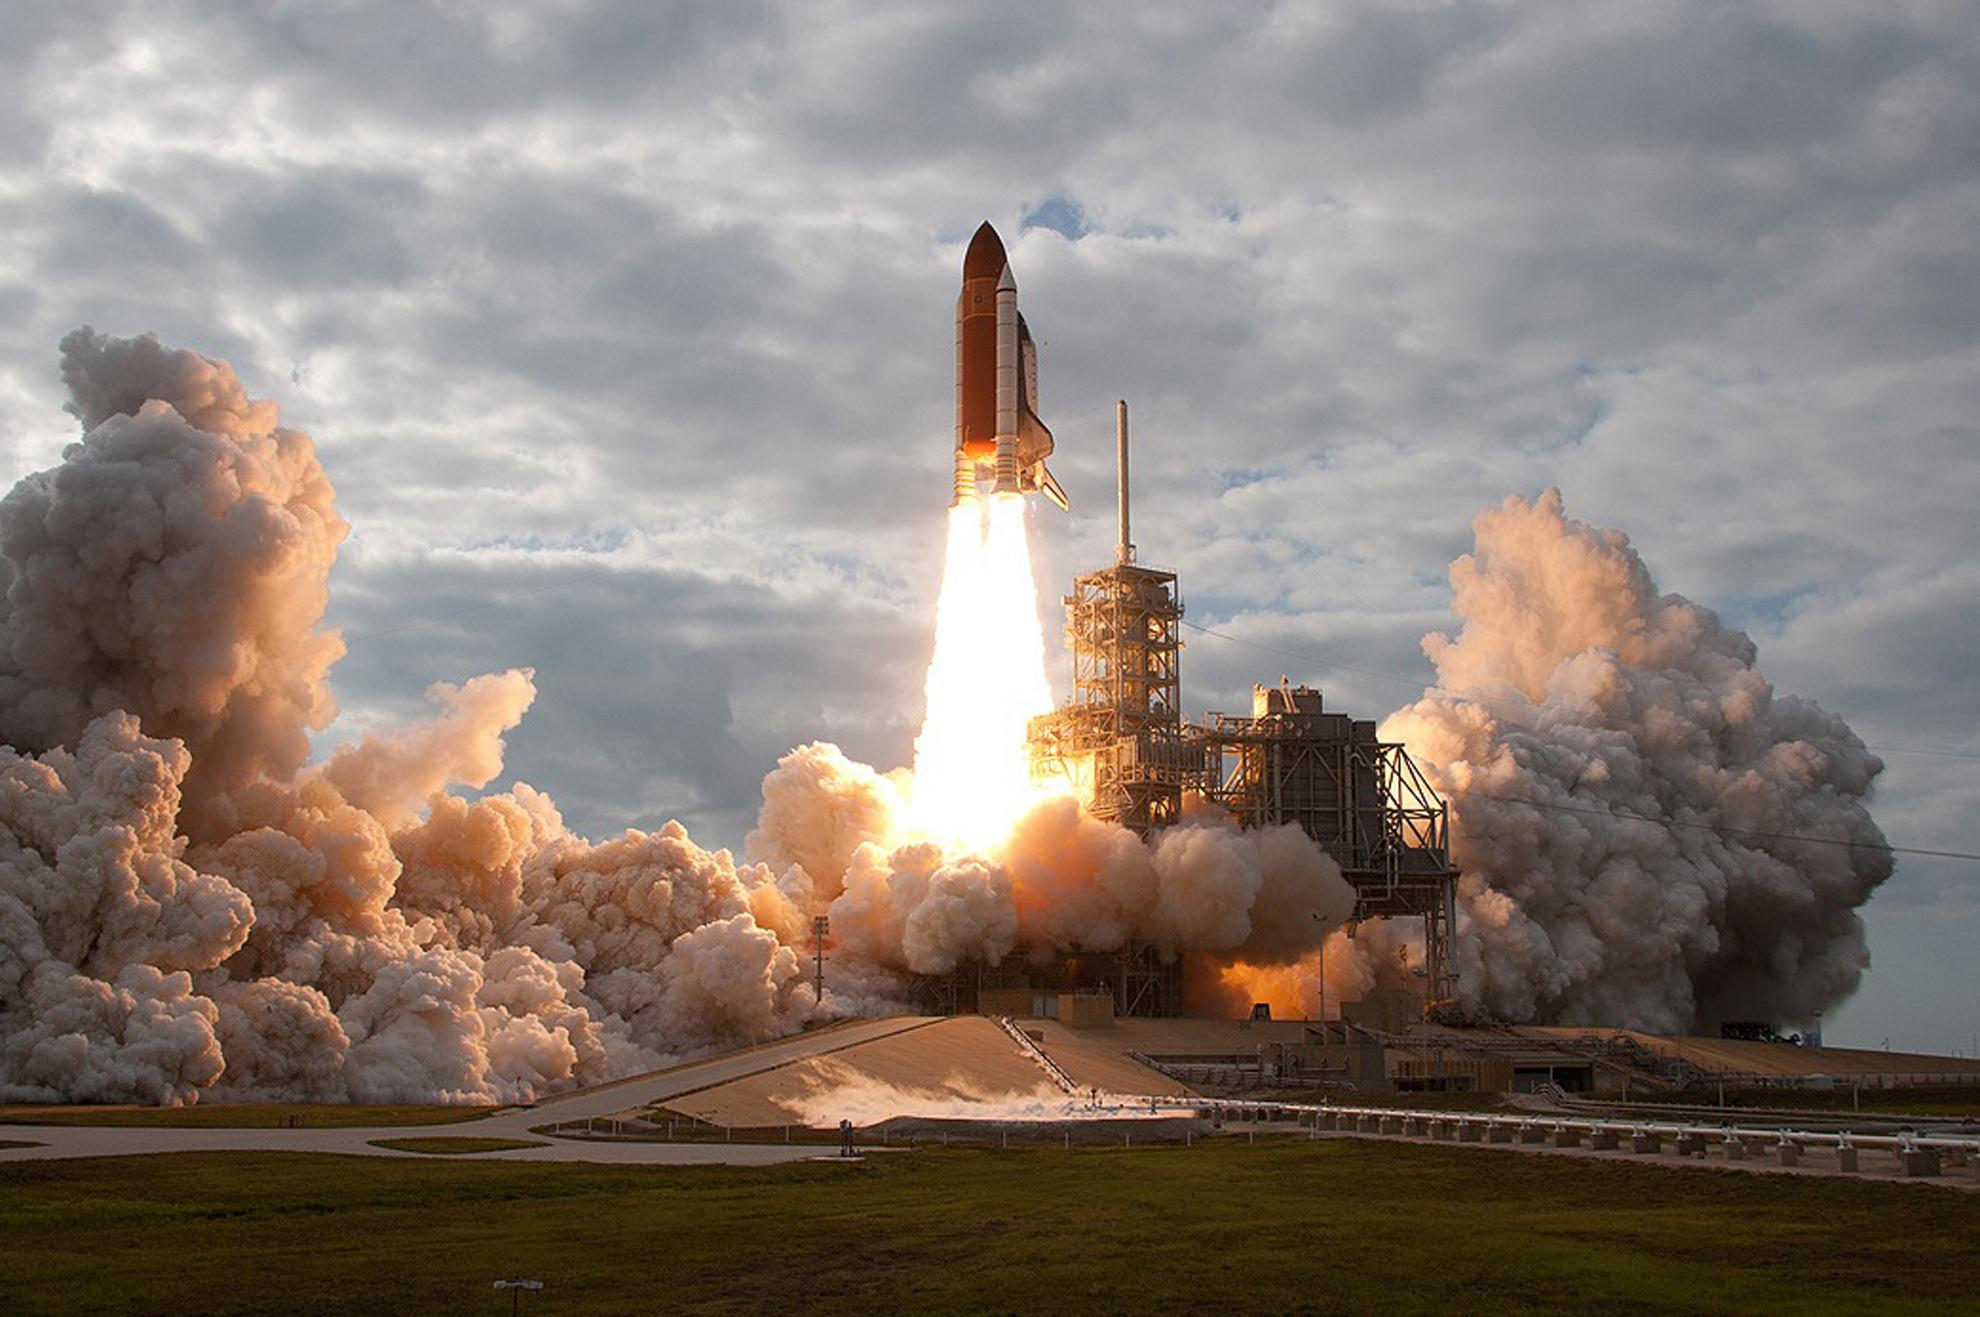 future rocket taking off - HD1980×1290